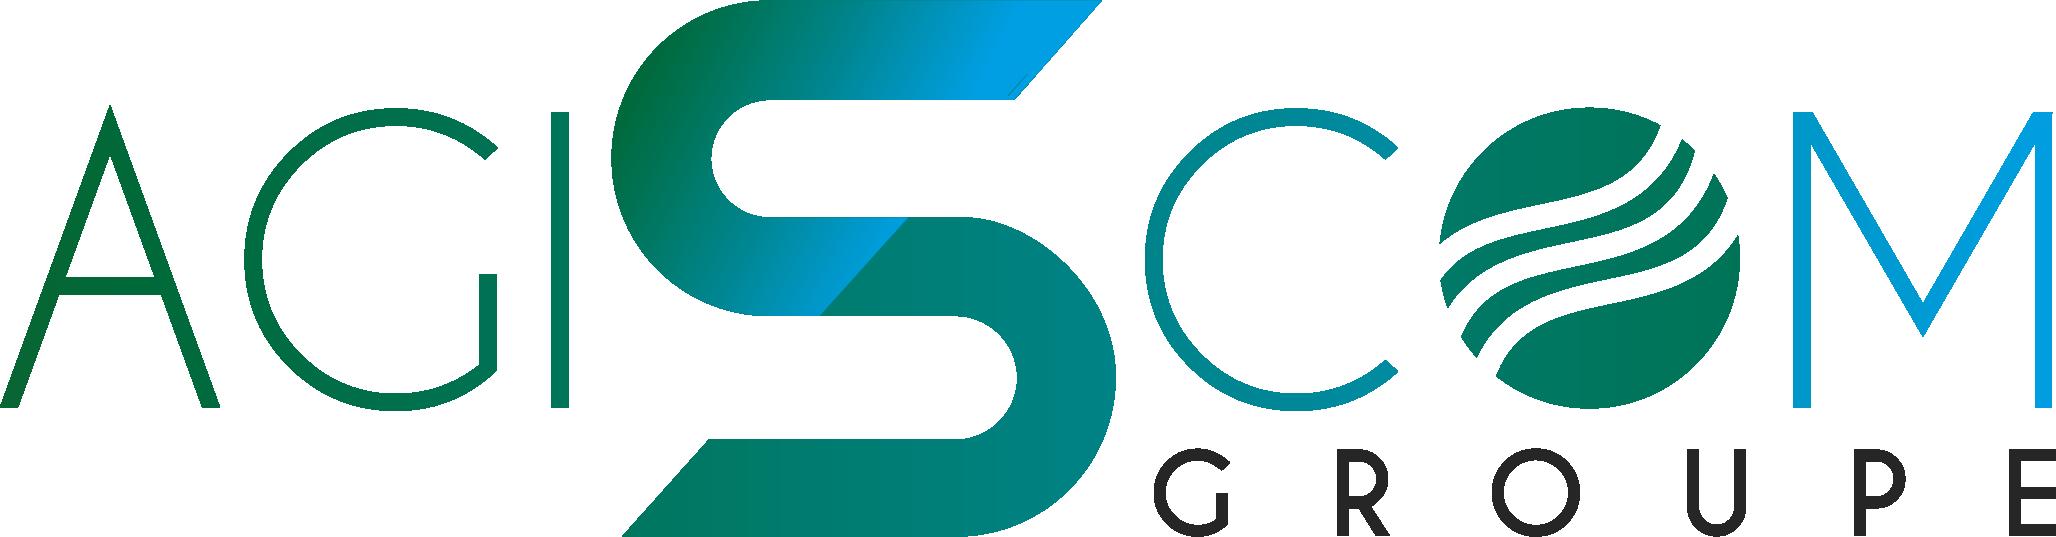 Logo Ggiscomgroupe